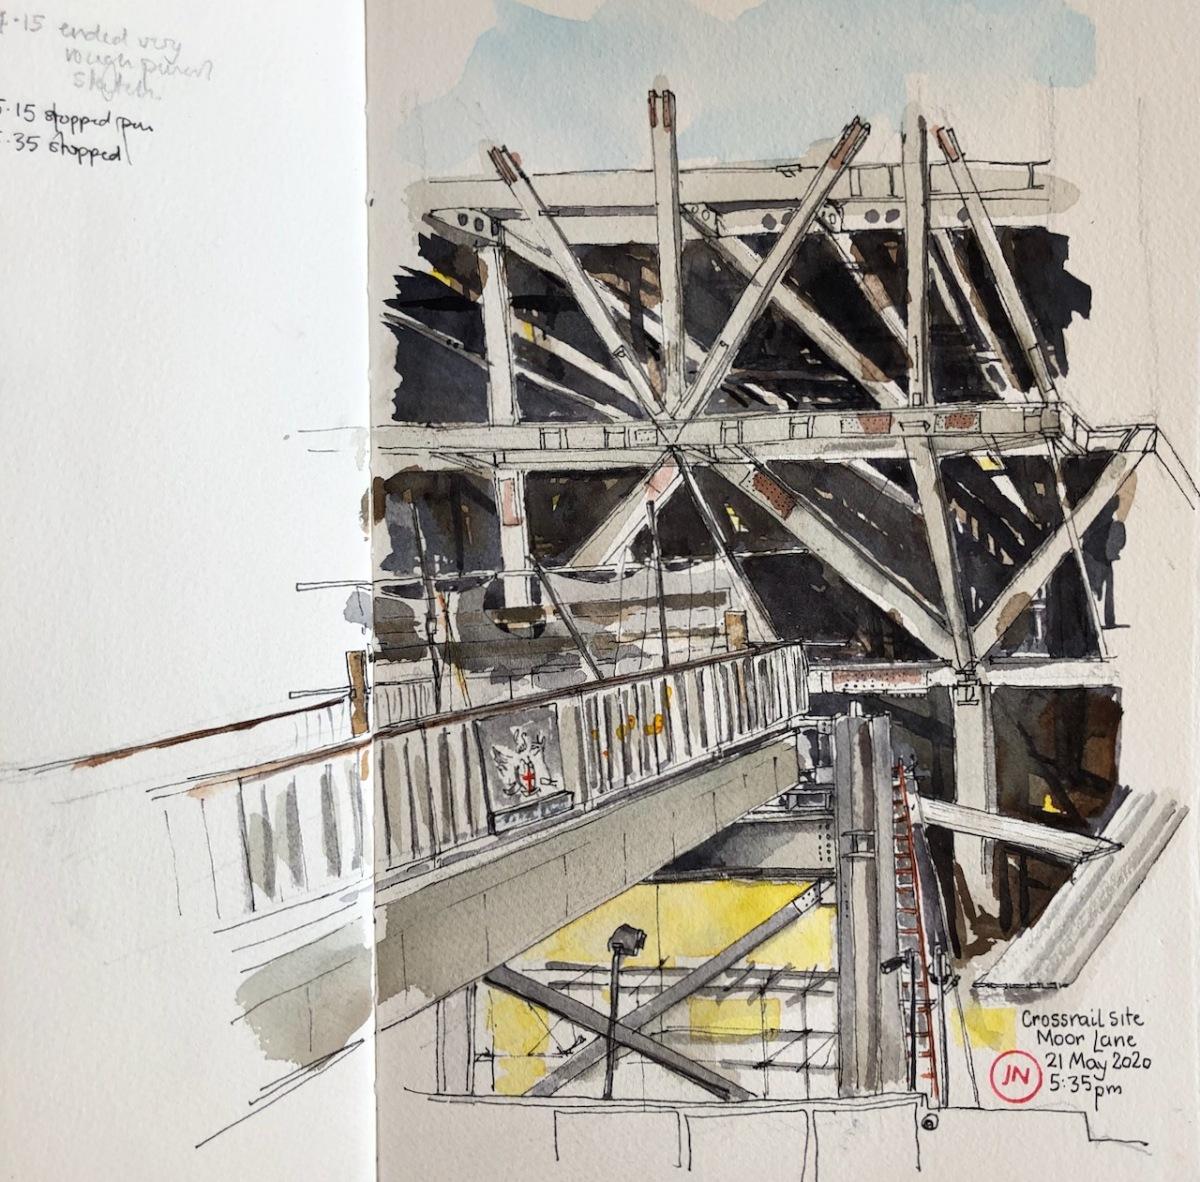 Crossrail site, Moor LaneEC2